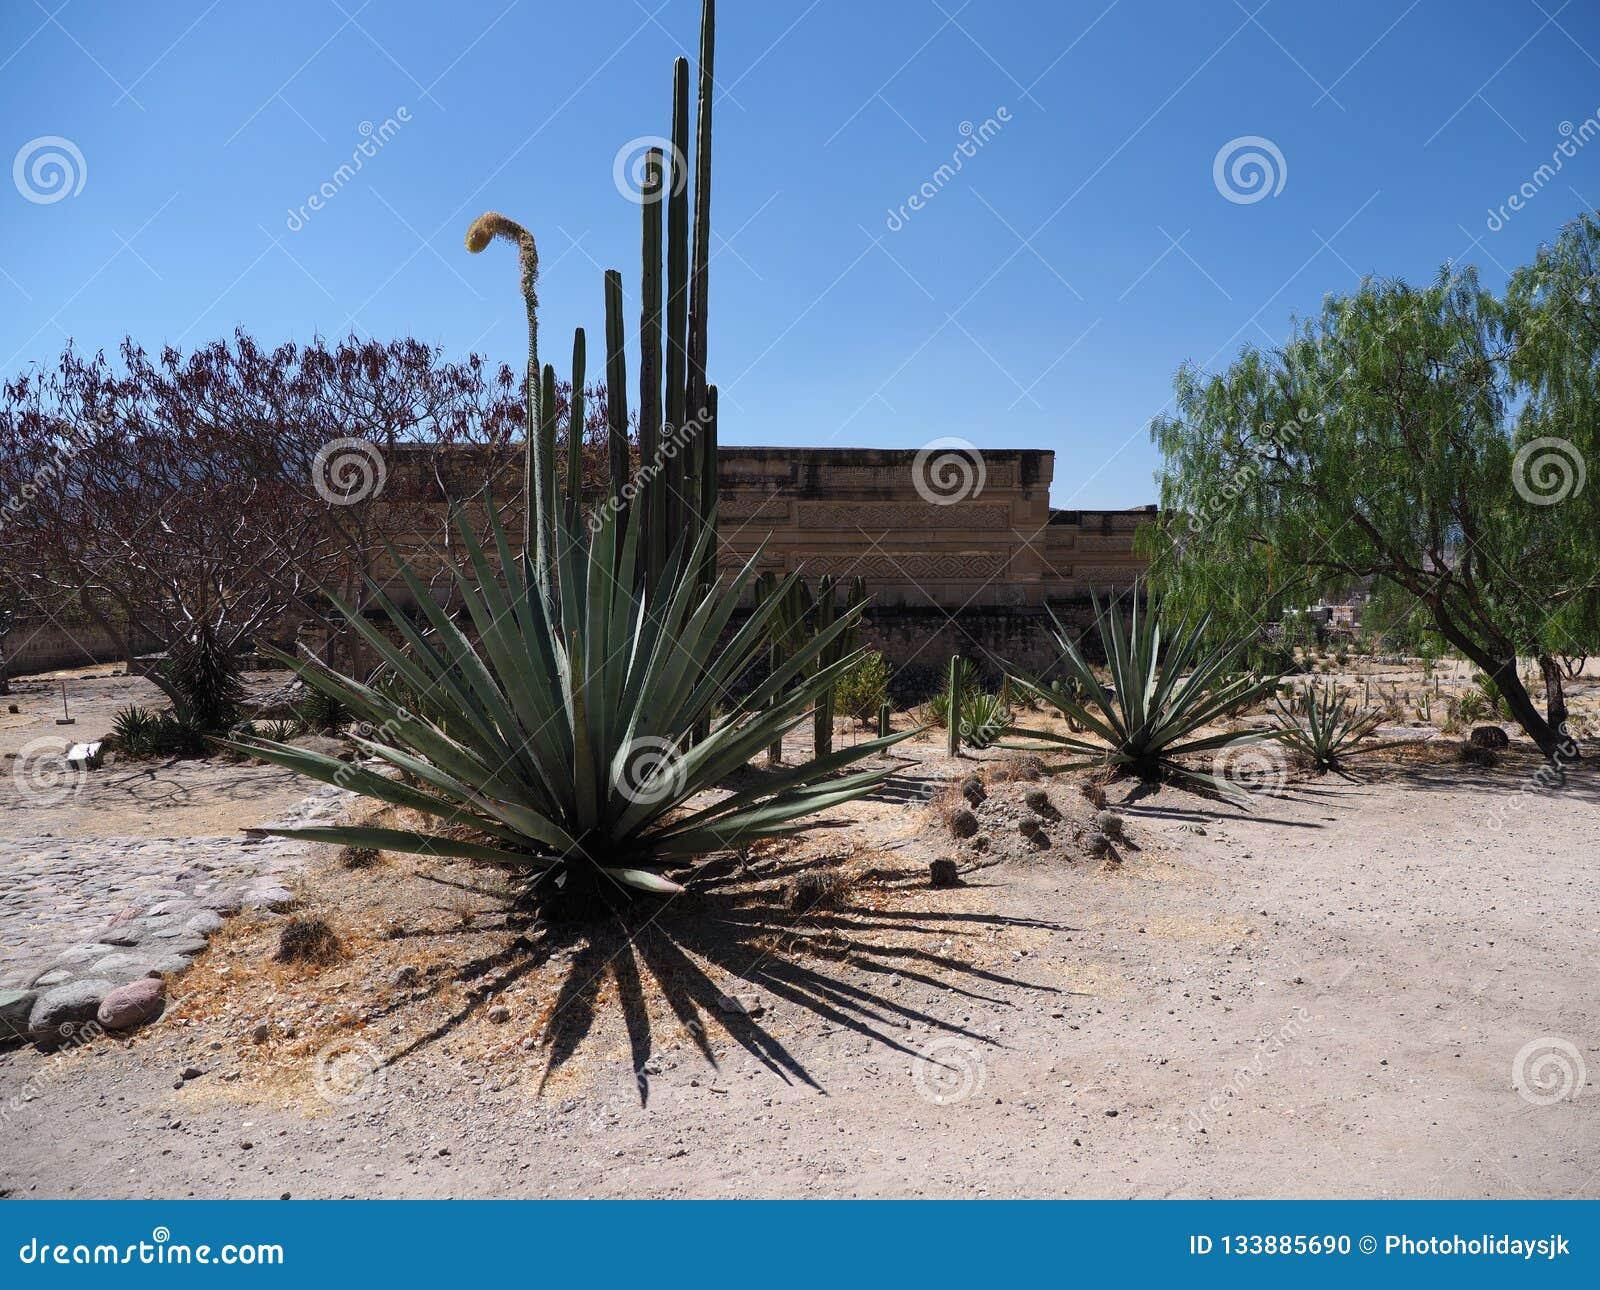 Agave grande na cidade de Mitla no local arqueológico importante da cultura de Zapotec no estado de Oaxaca na paisagem de México